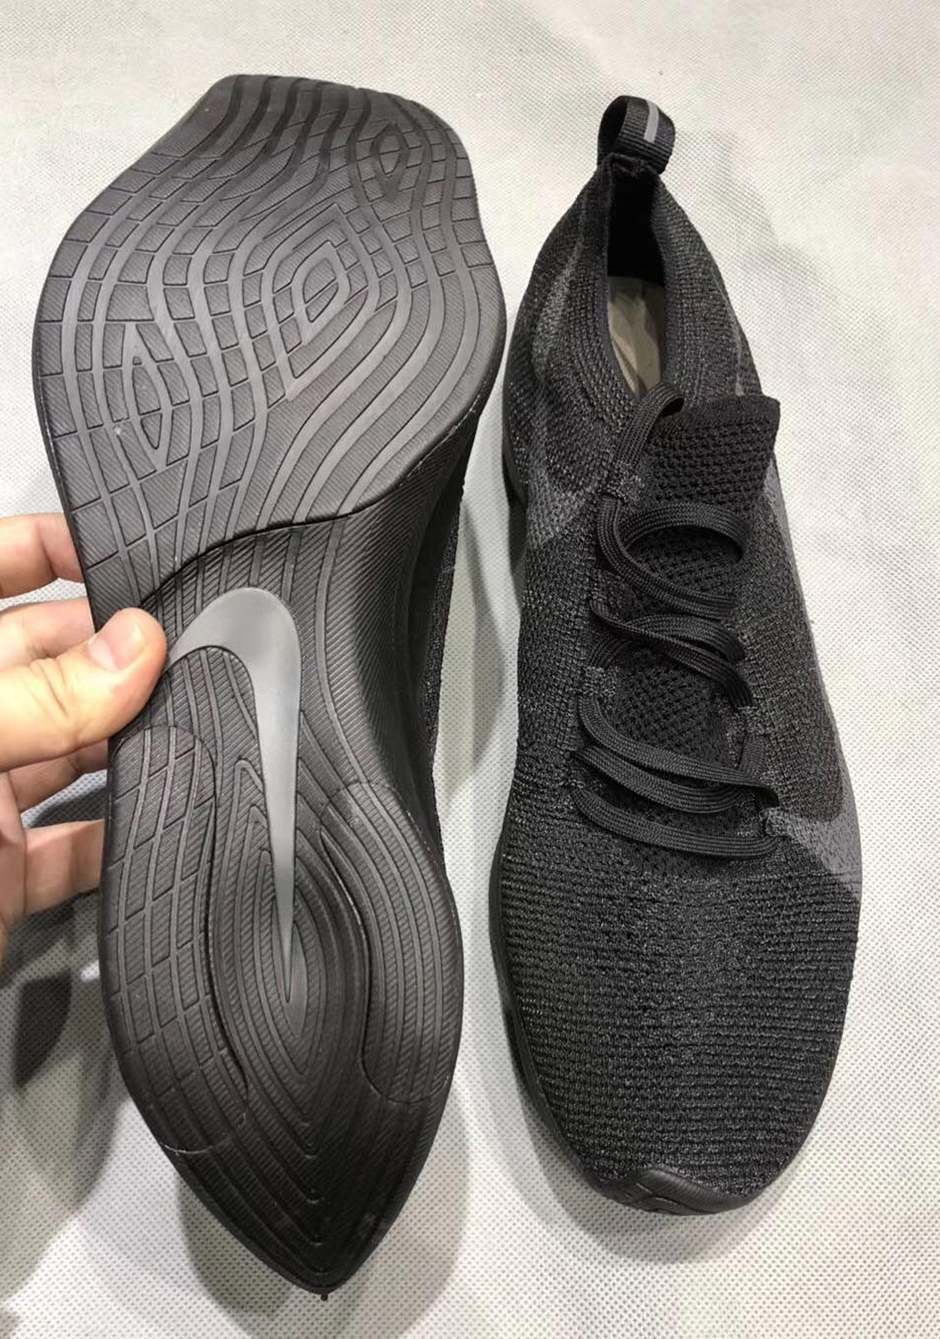 nike-vapor-street-flyknit-black-spring-2018-2 - SneakerNews.